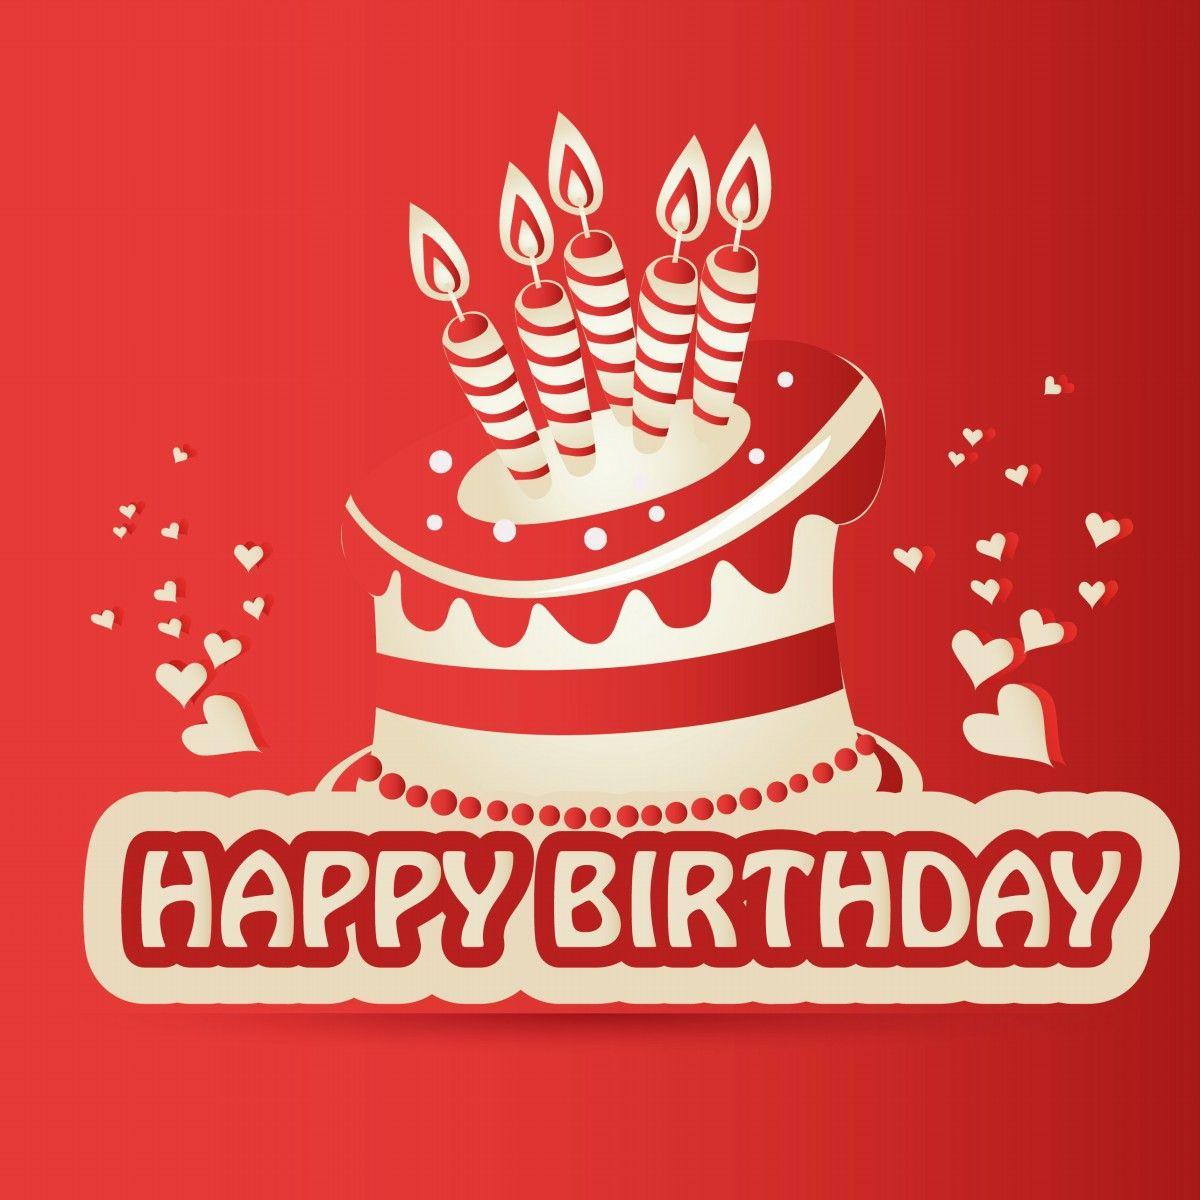 ecards4u provides happy birthday quotes, happy birthday